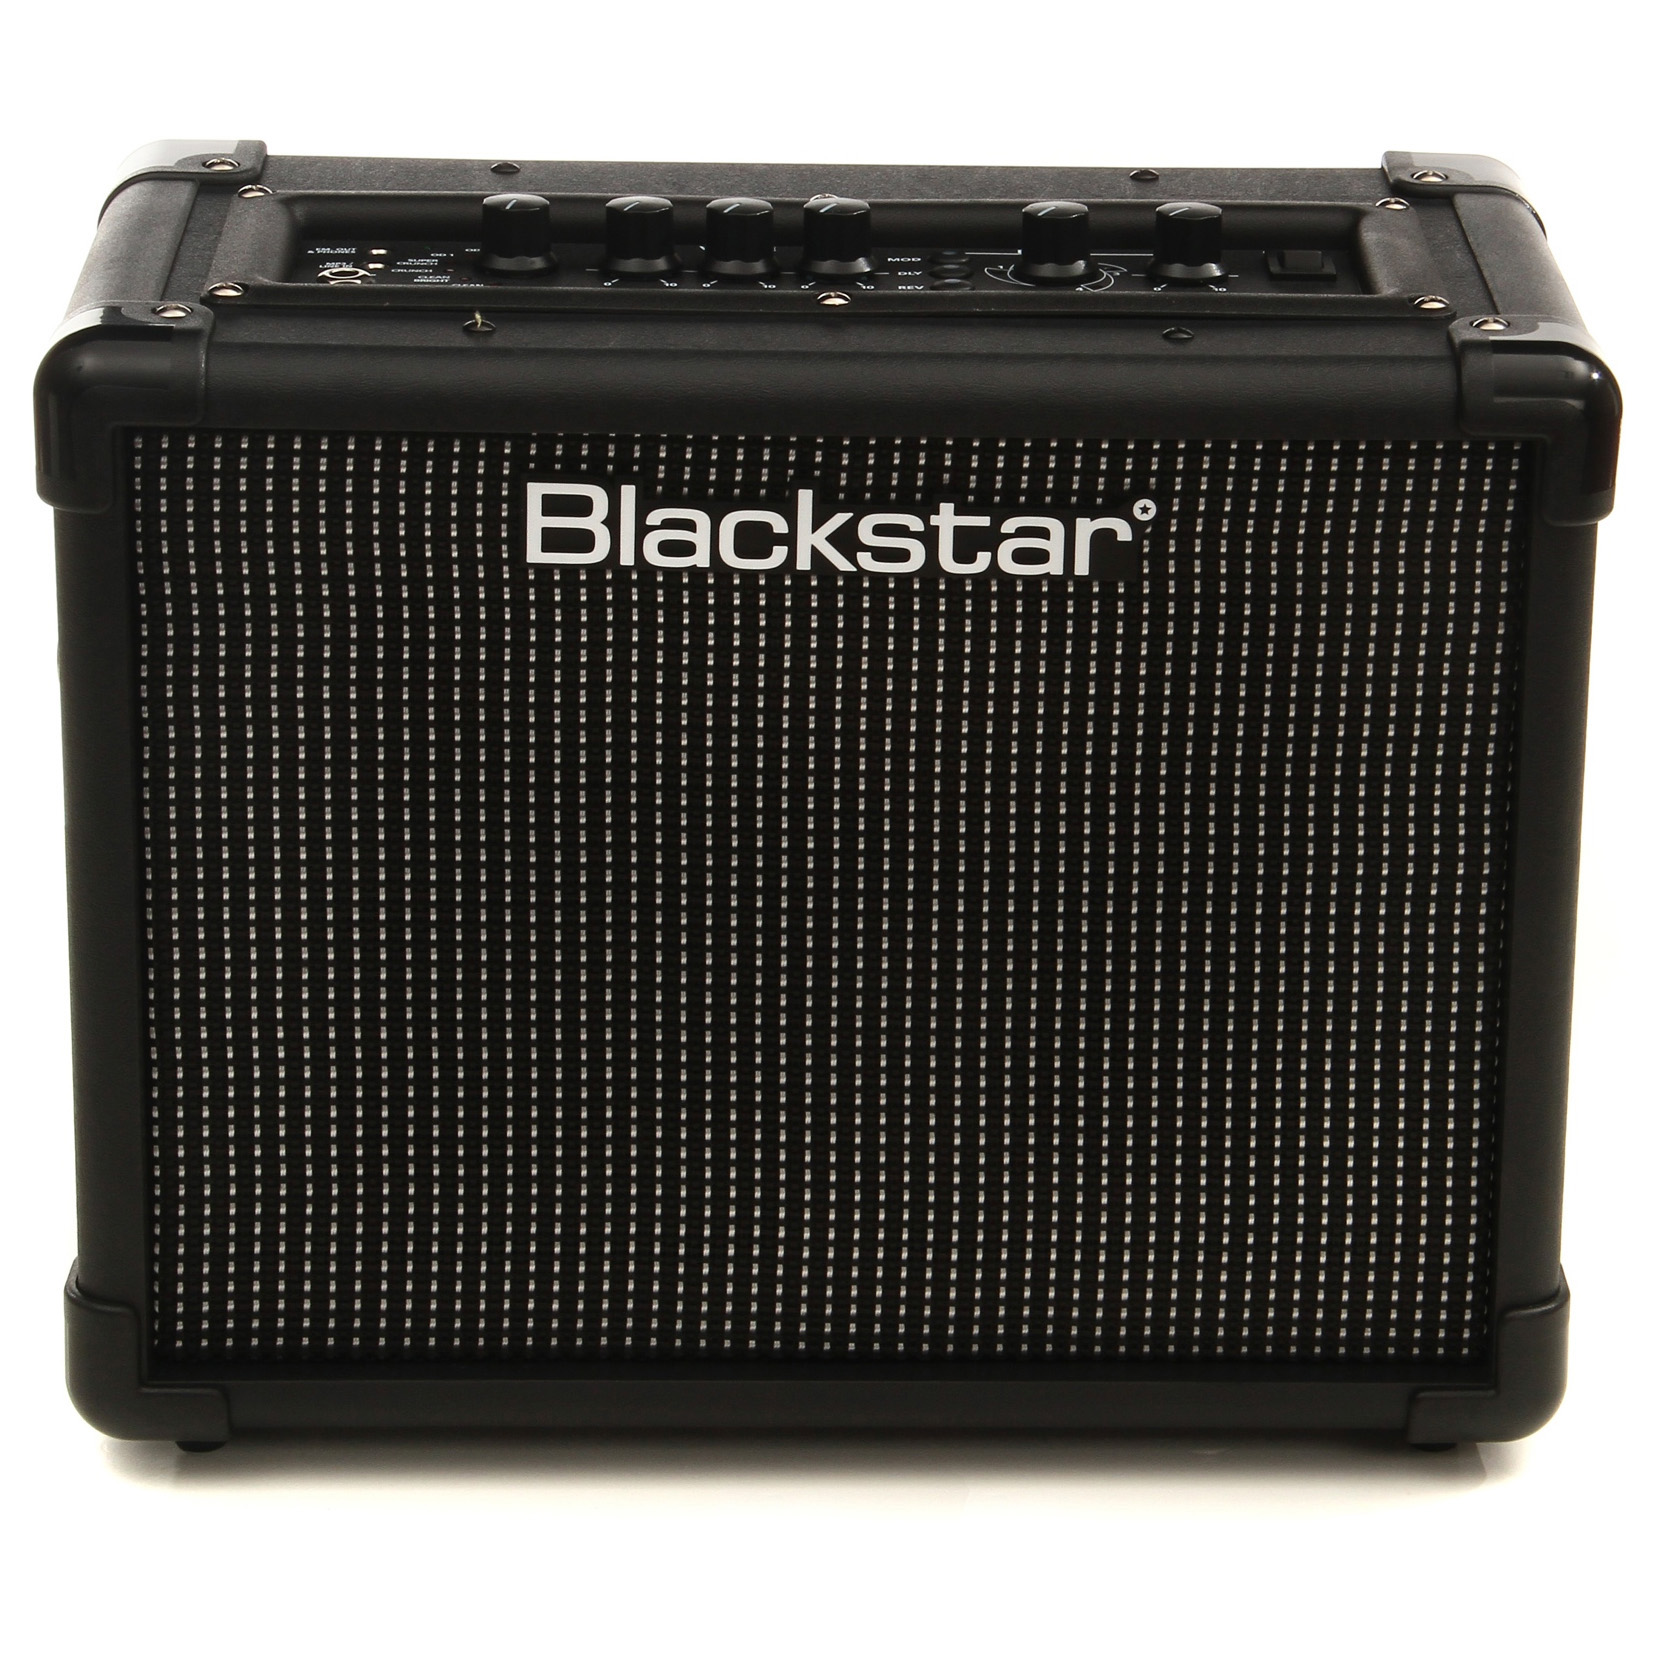 blackstar id core stereo 10 guitar amp ebay. Black Bedroom Furniture Sets. Home Design Ideas